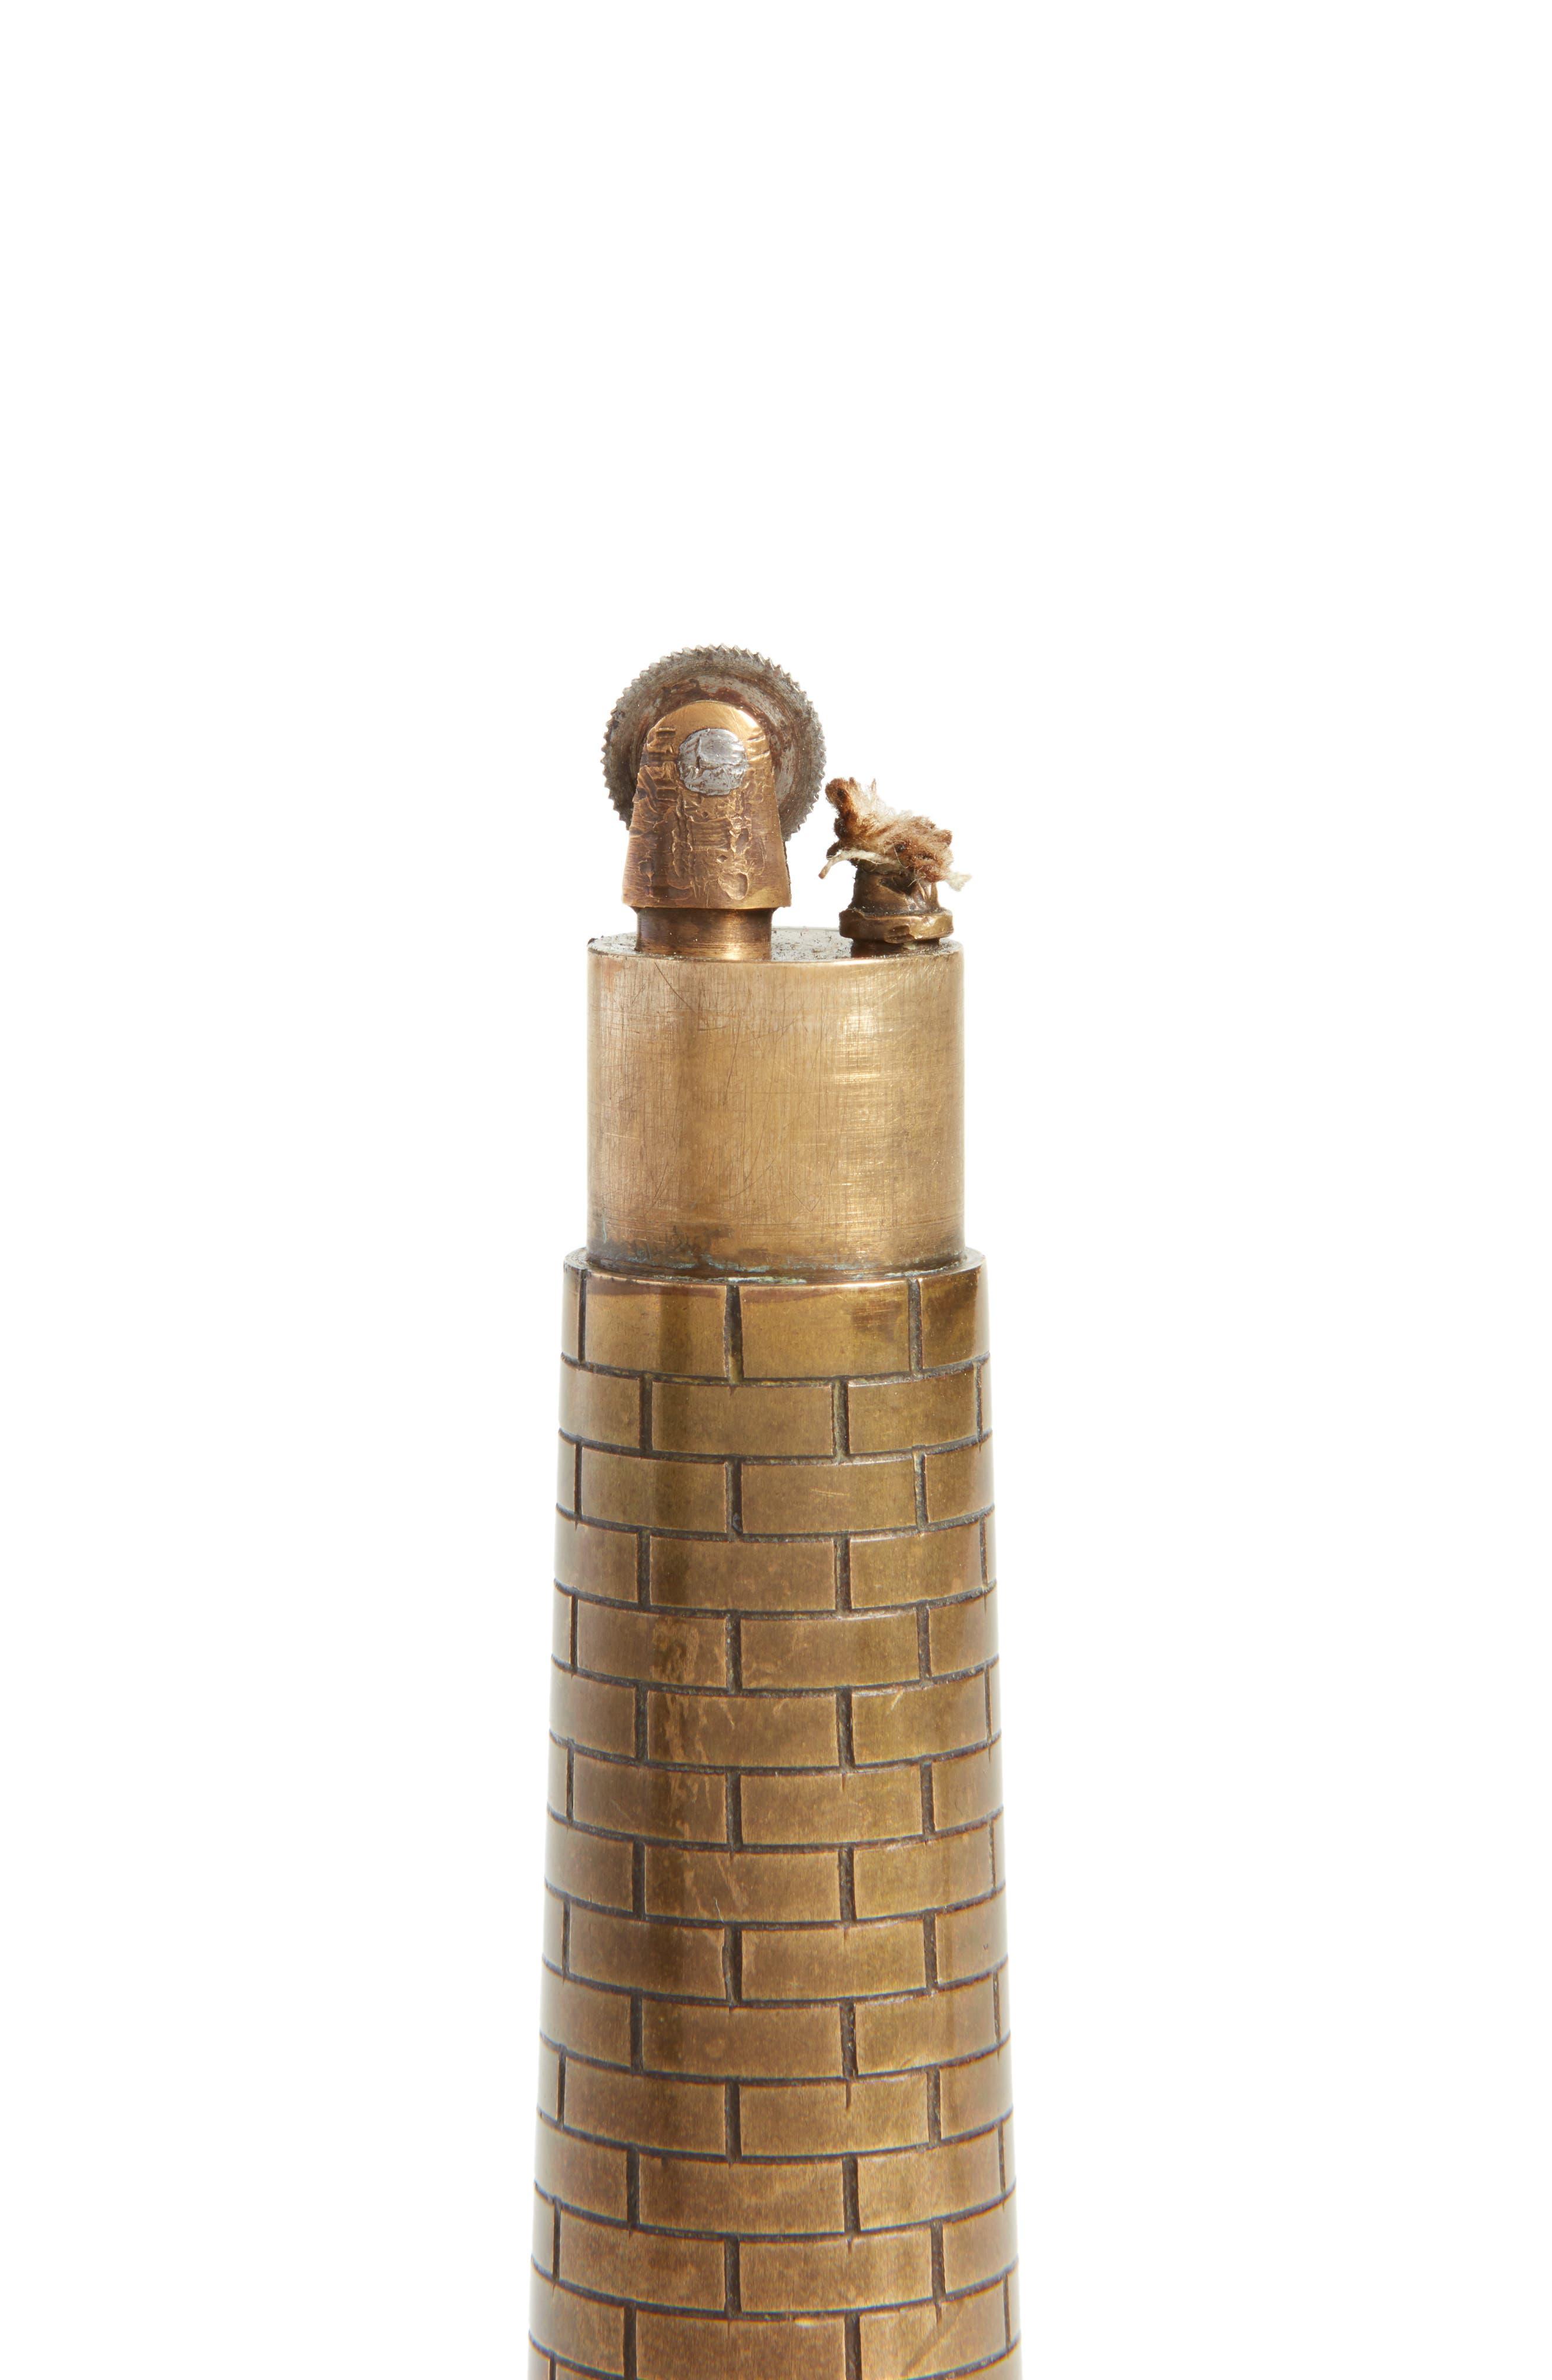 One of a Kind Vintage Brass Lighthouse Table Lighter,                             Alternate thumbnail 2, color,                             BRONZE